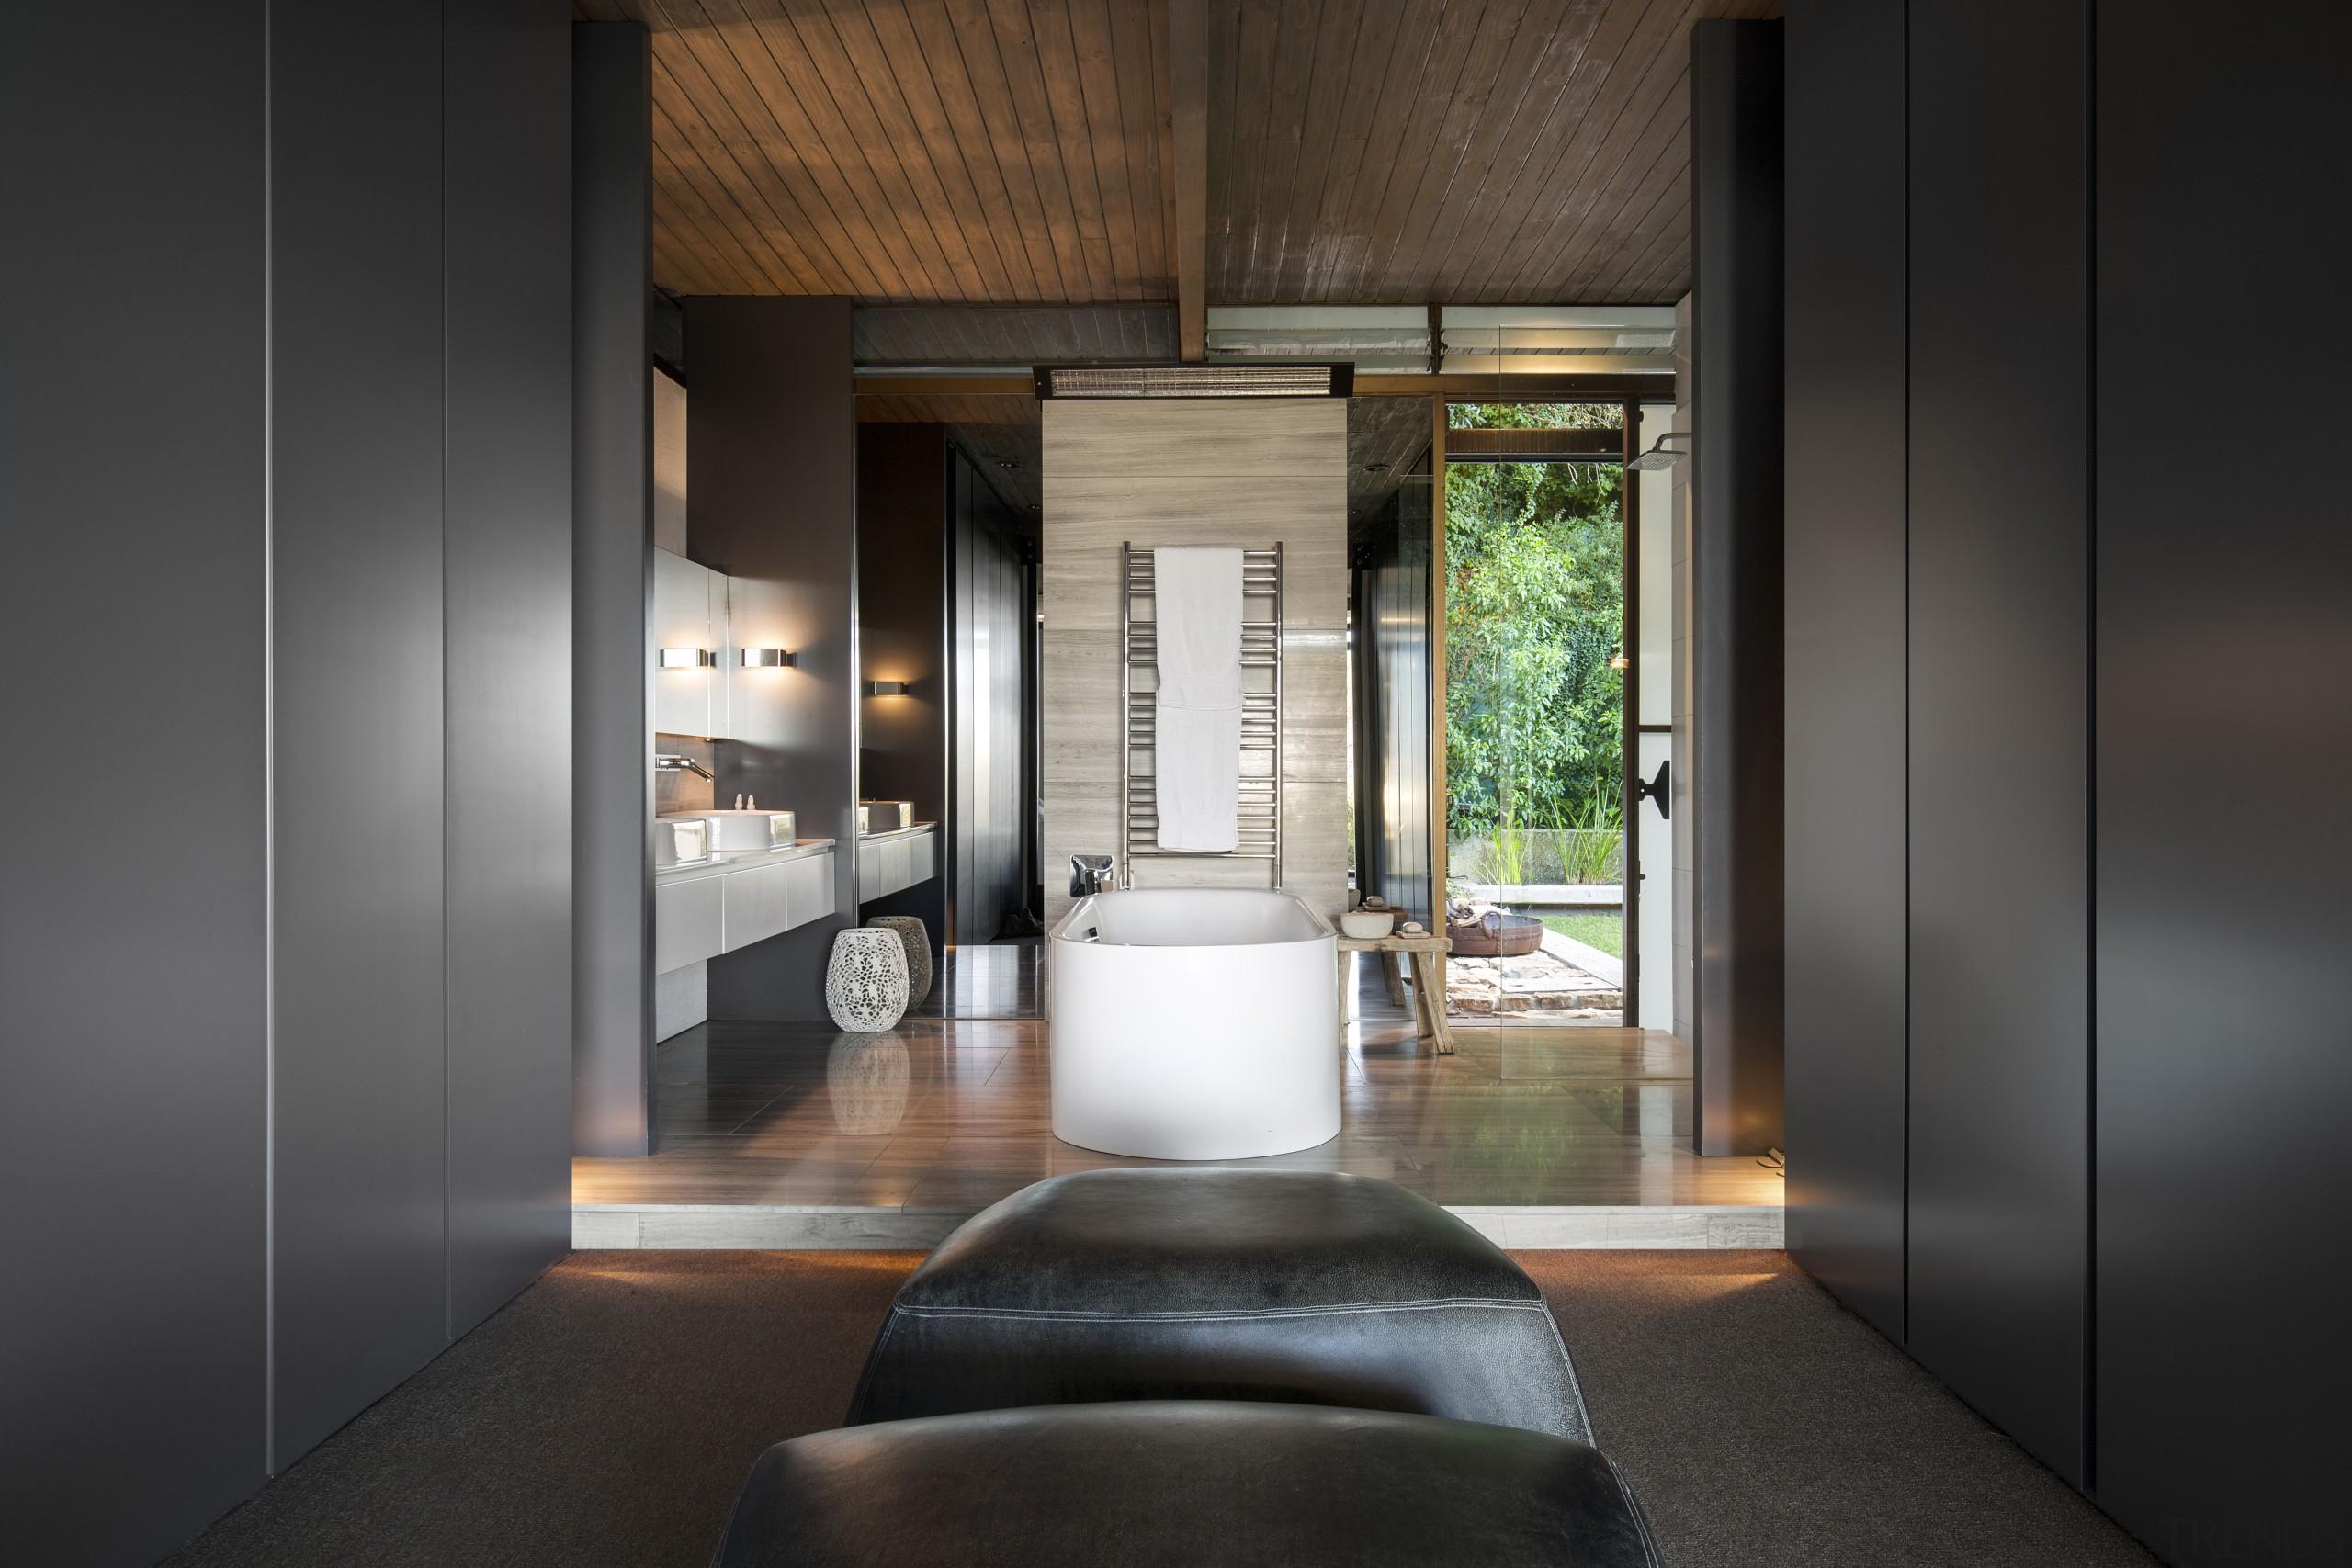 In this renovated master suite, the new bathroom architecture, interior design, black, gray